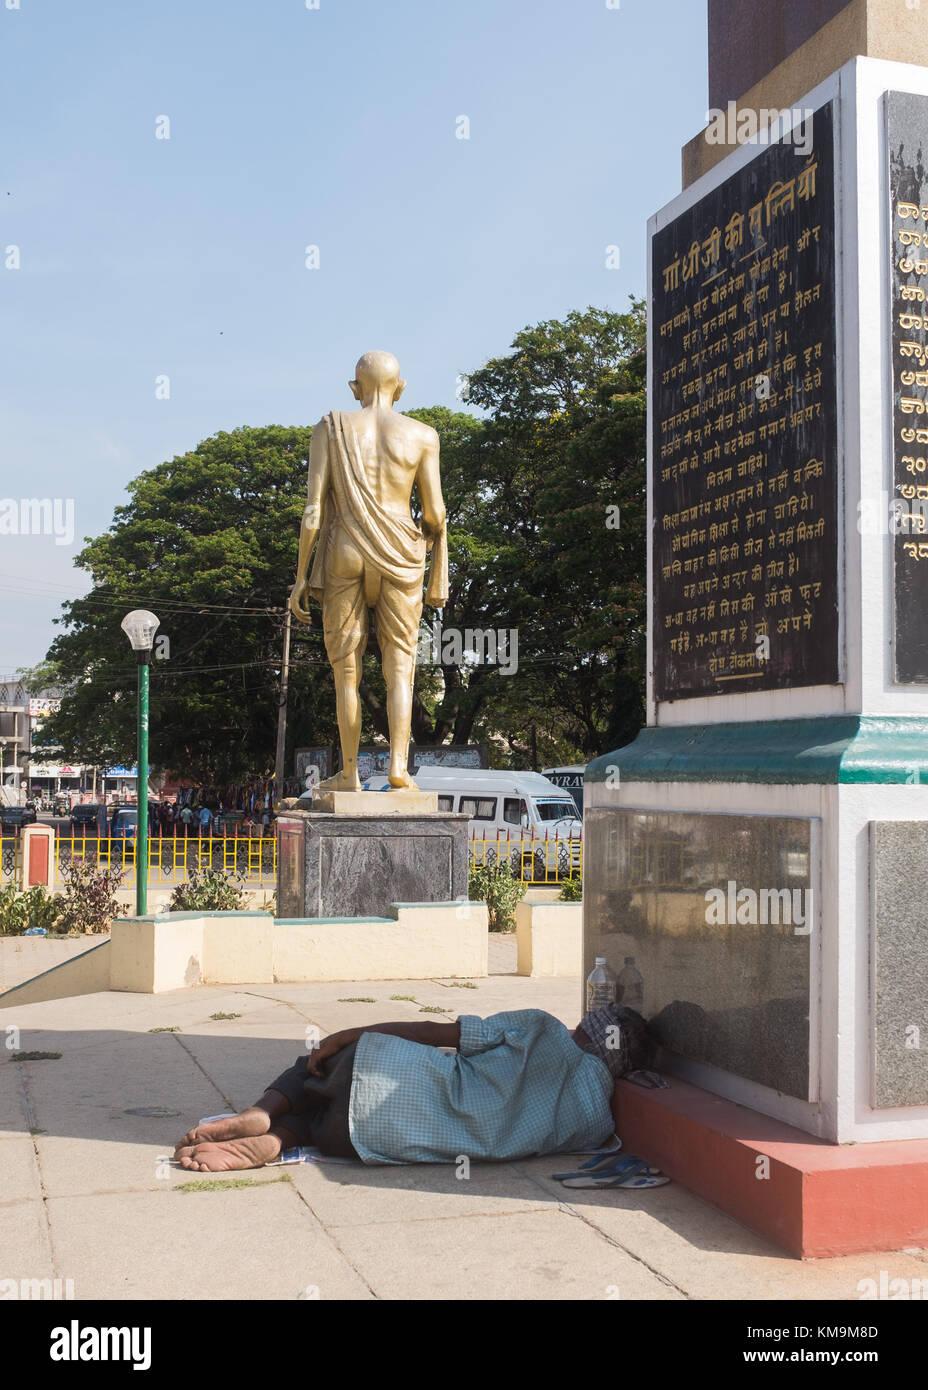 Man sleeping near Gandhi memorial, Mysore, Karnataka, India. - Stock Image